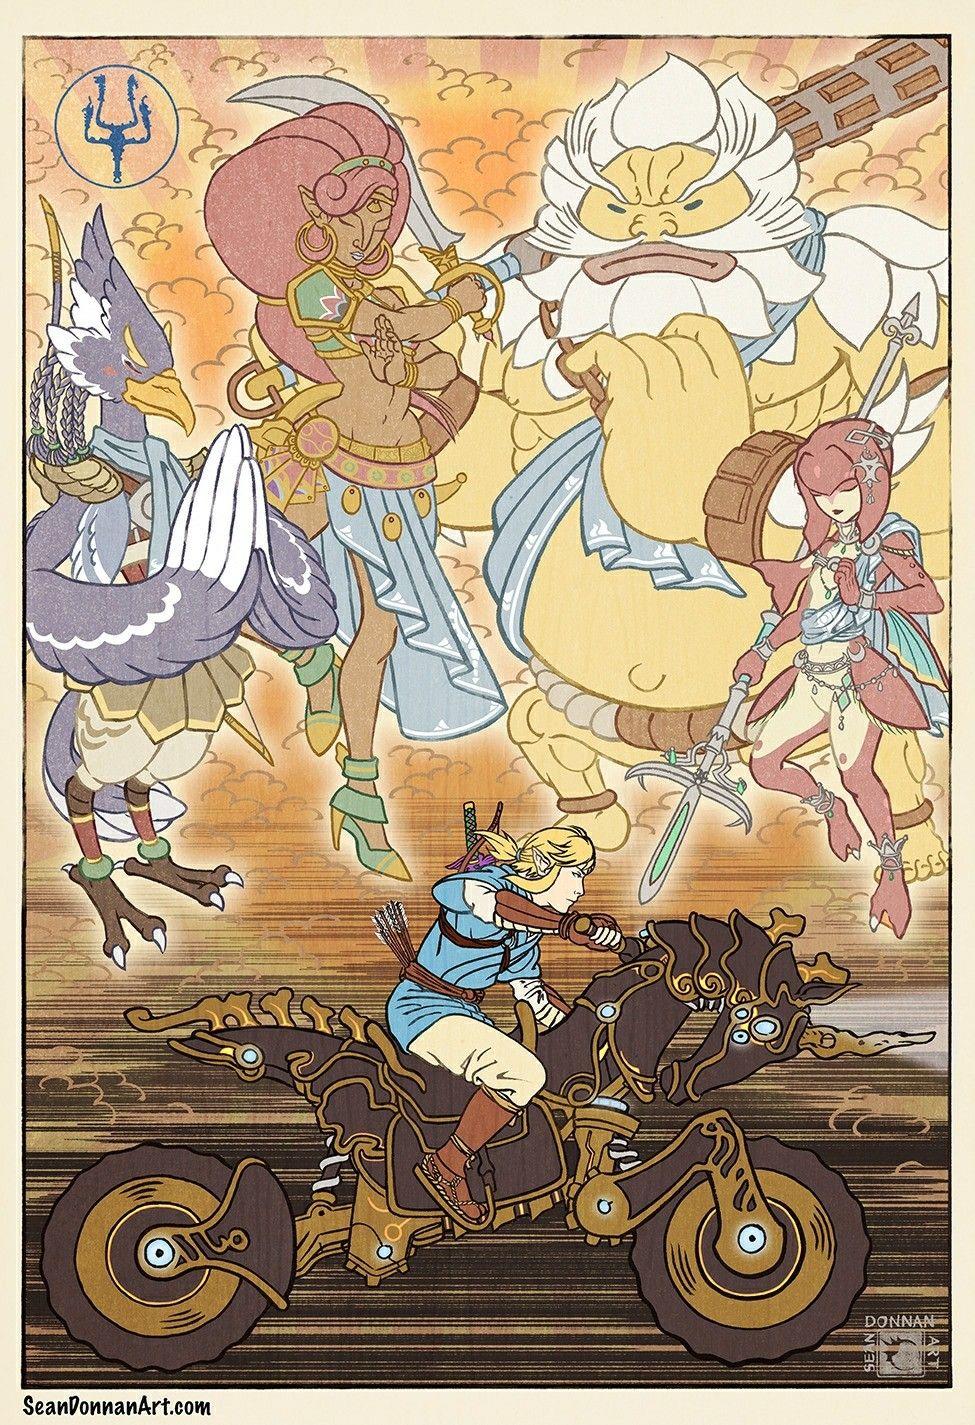 5d965a3b9be The Champions' Ballad Hyrule Warriors, Legend Of Zelda Breath, Link Zelda,  Breath